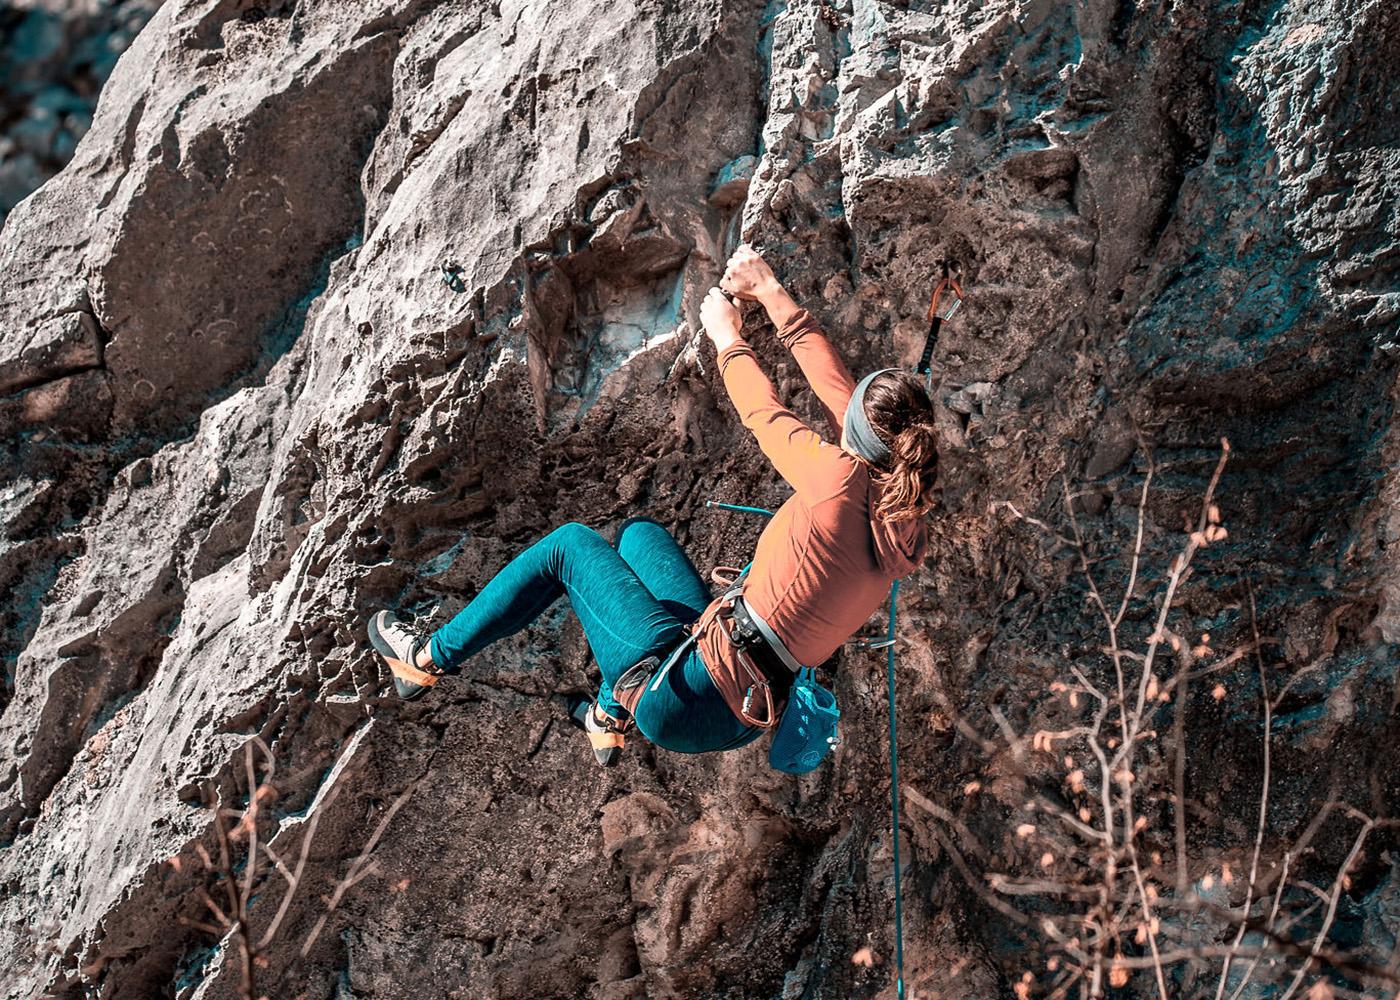 Munich Mountain Girl Hanna Hörmann beim alpinen Klettern